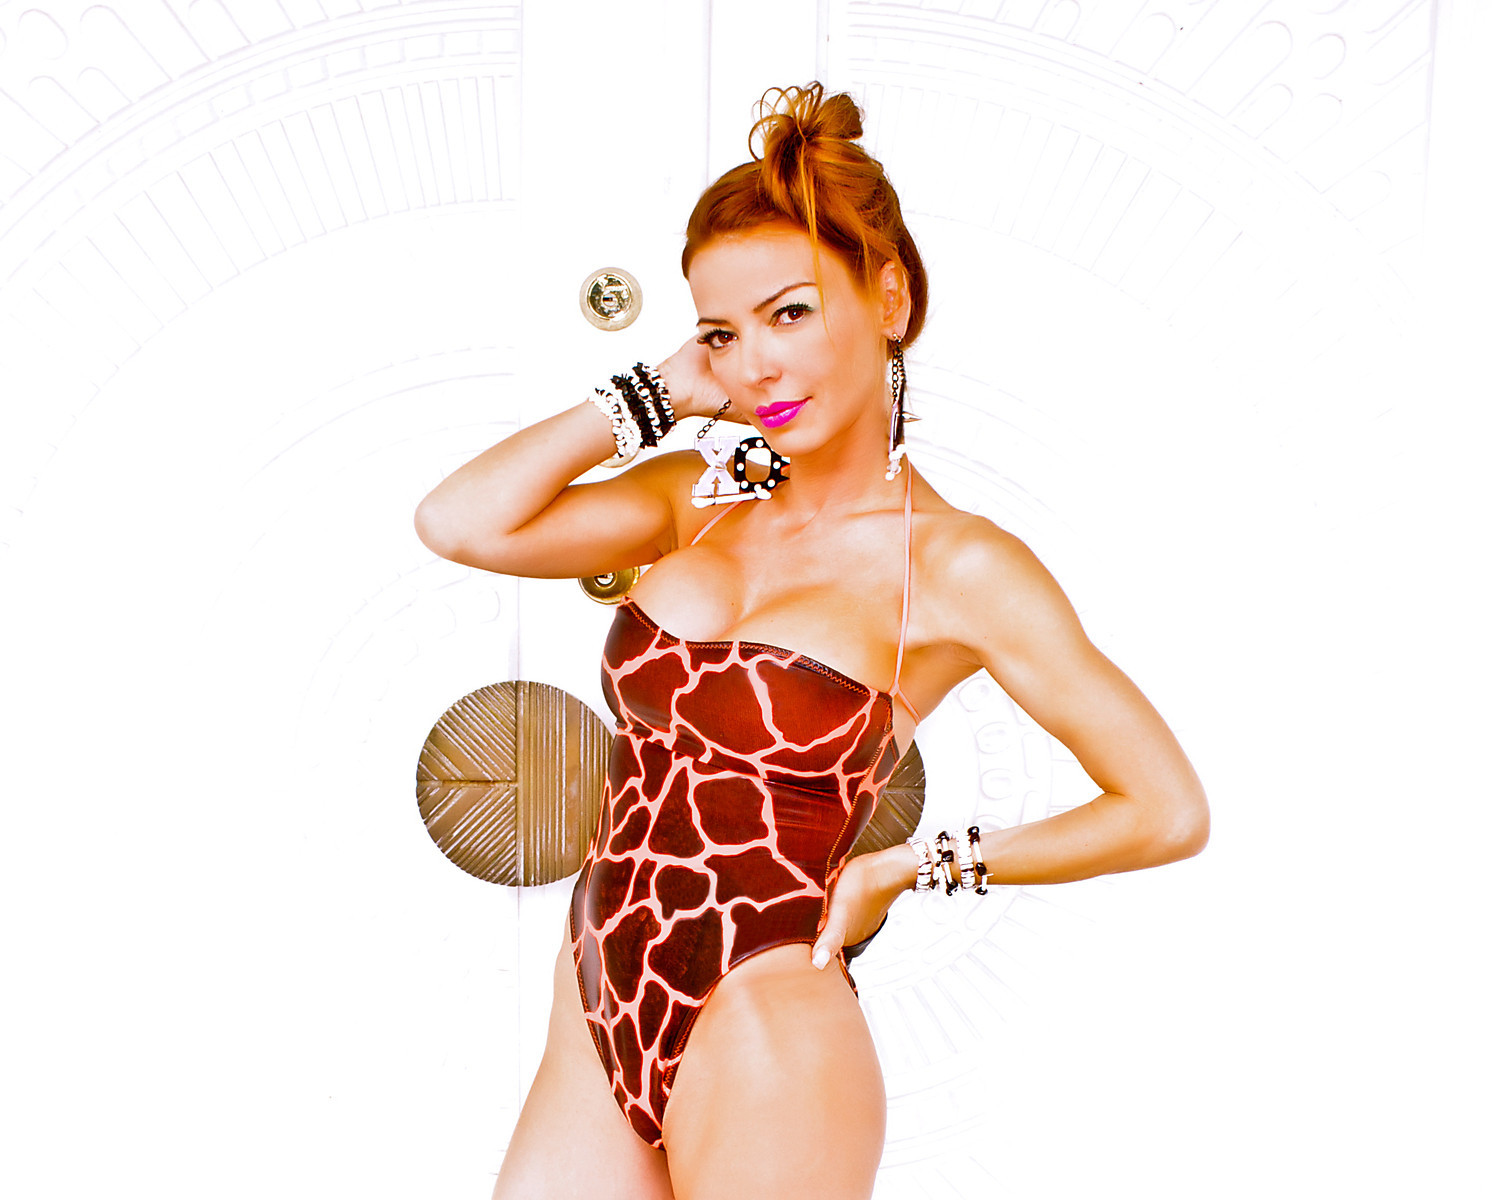 PHOTOS Drita D'Avanzo models new swimwear line for House of Jackie B - starcasm.net